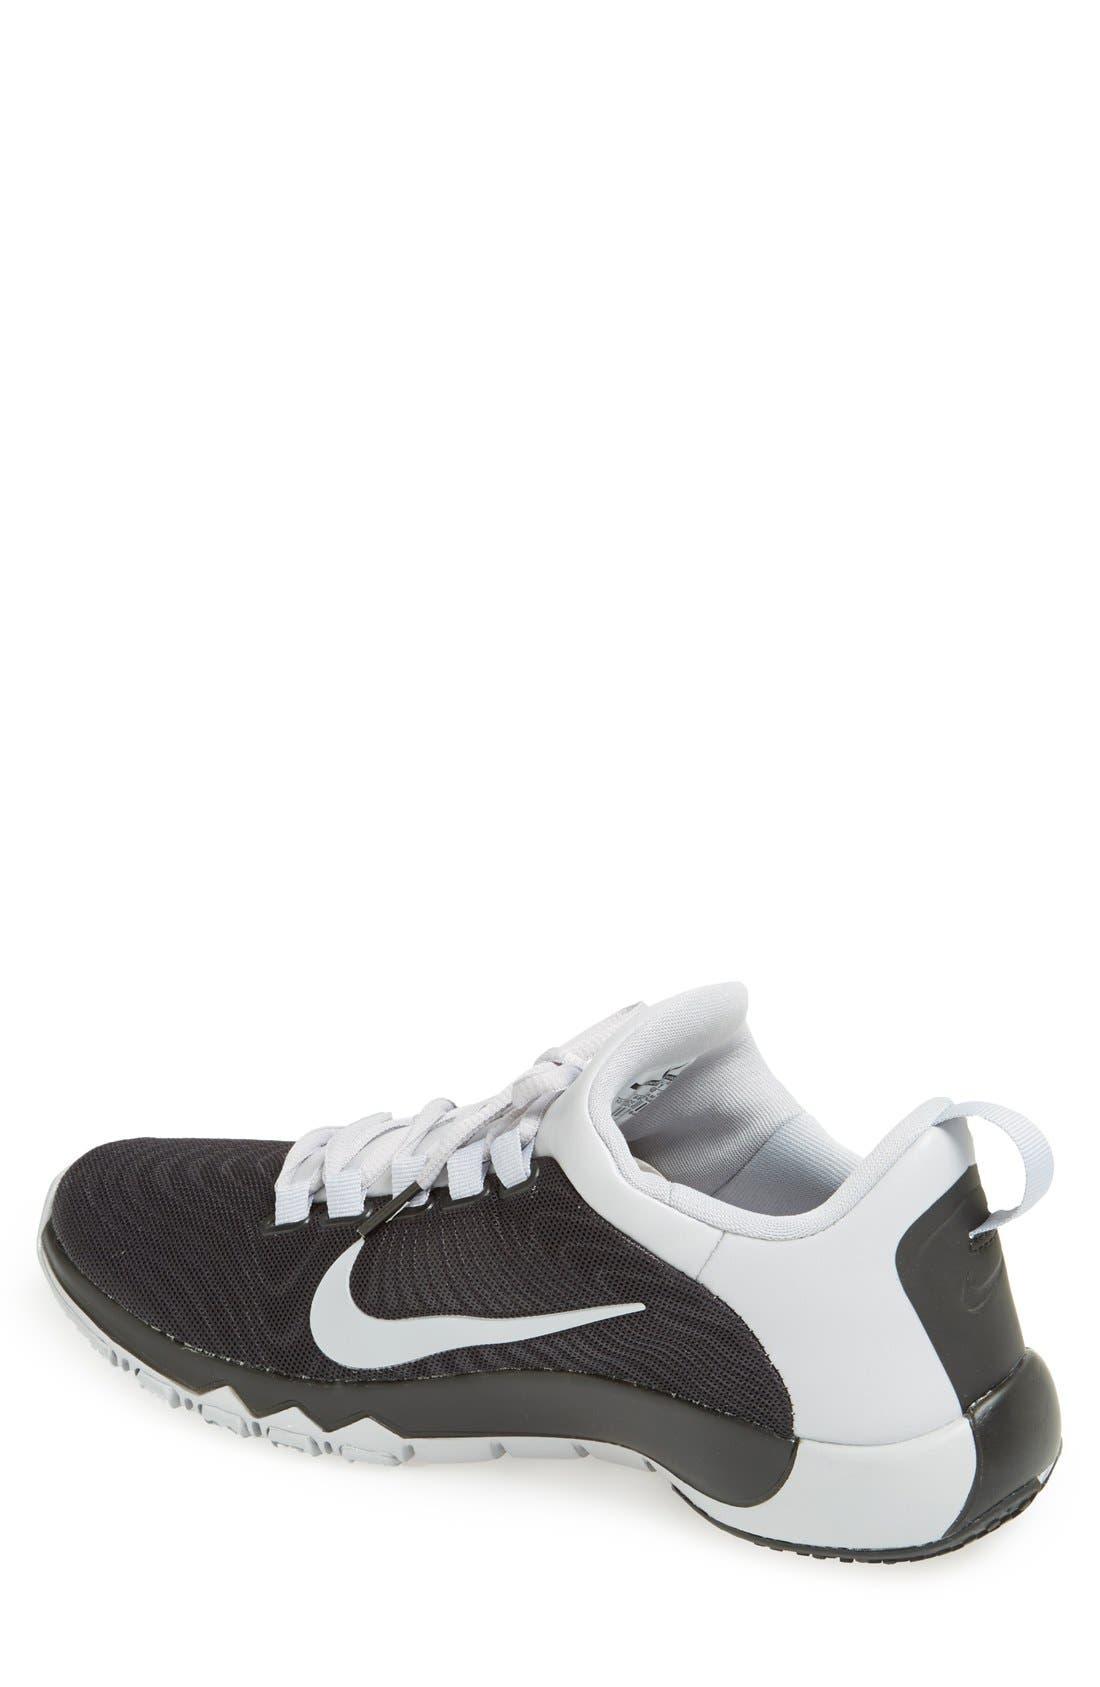 Alternate Image 3  - Nike 'Free 5.0 Trainer' Training Shoe (Men)